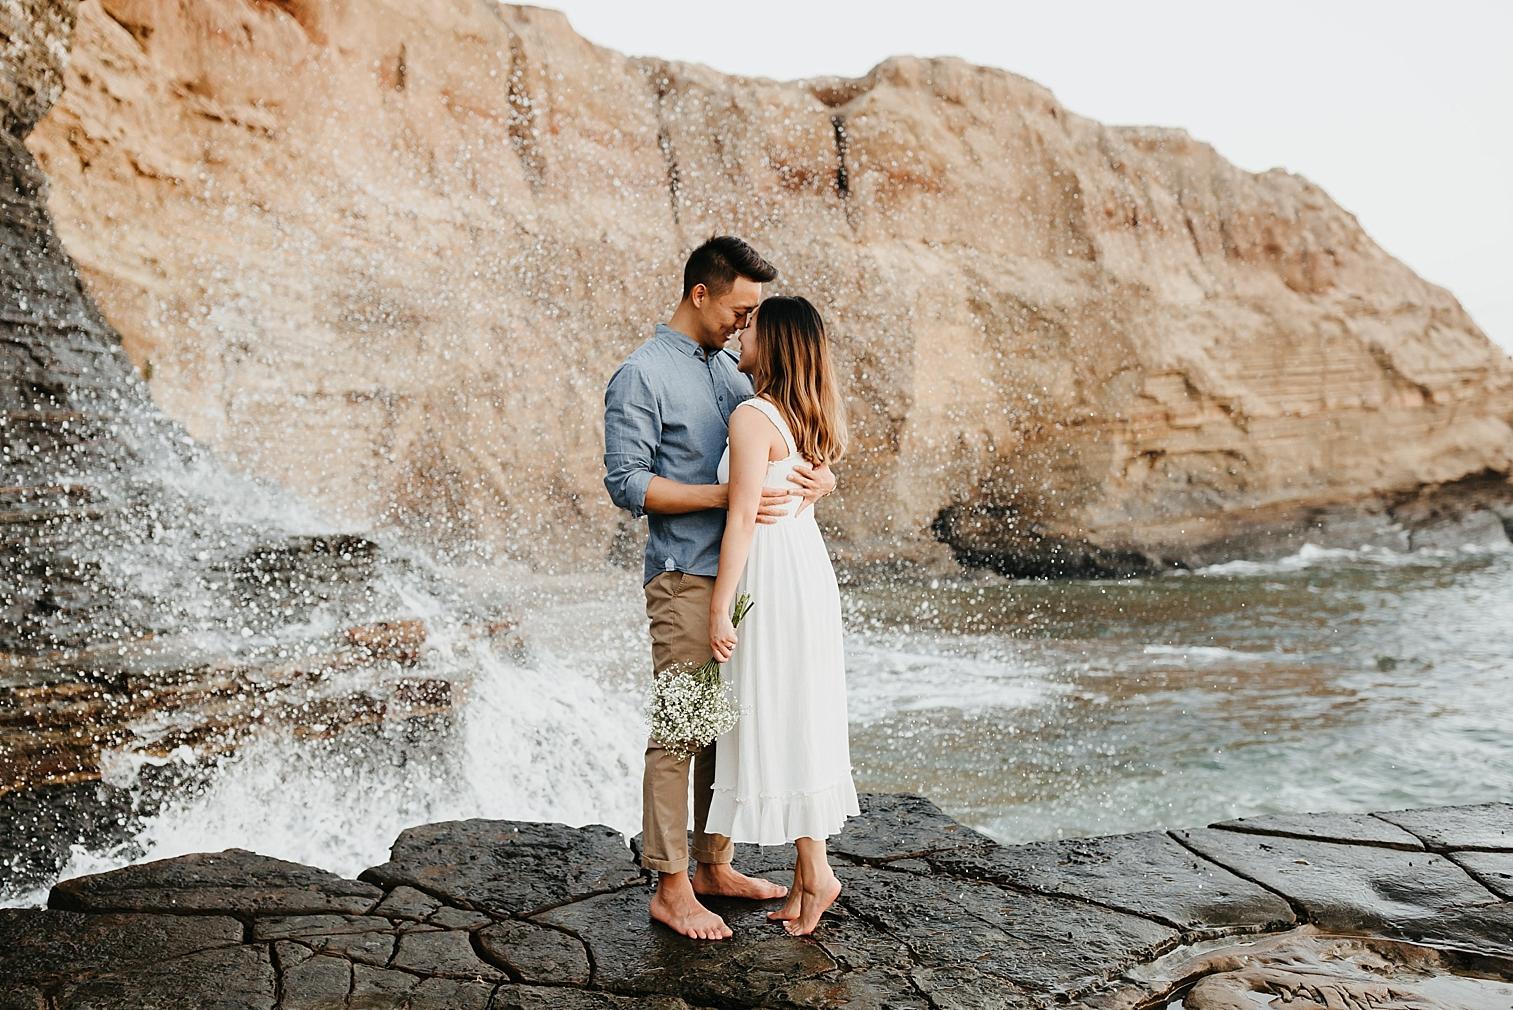 San-Diego-Ocean-Beach-Engagement-Session-38.jpg